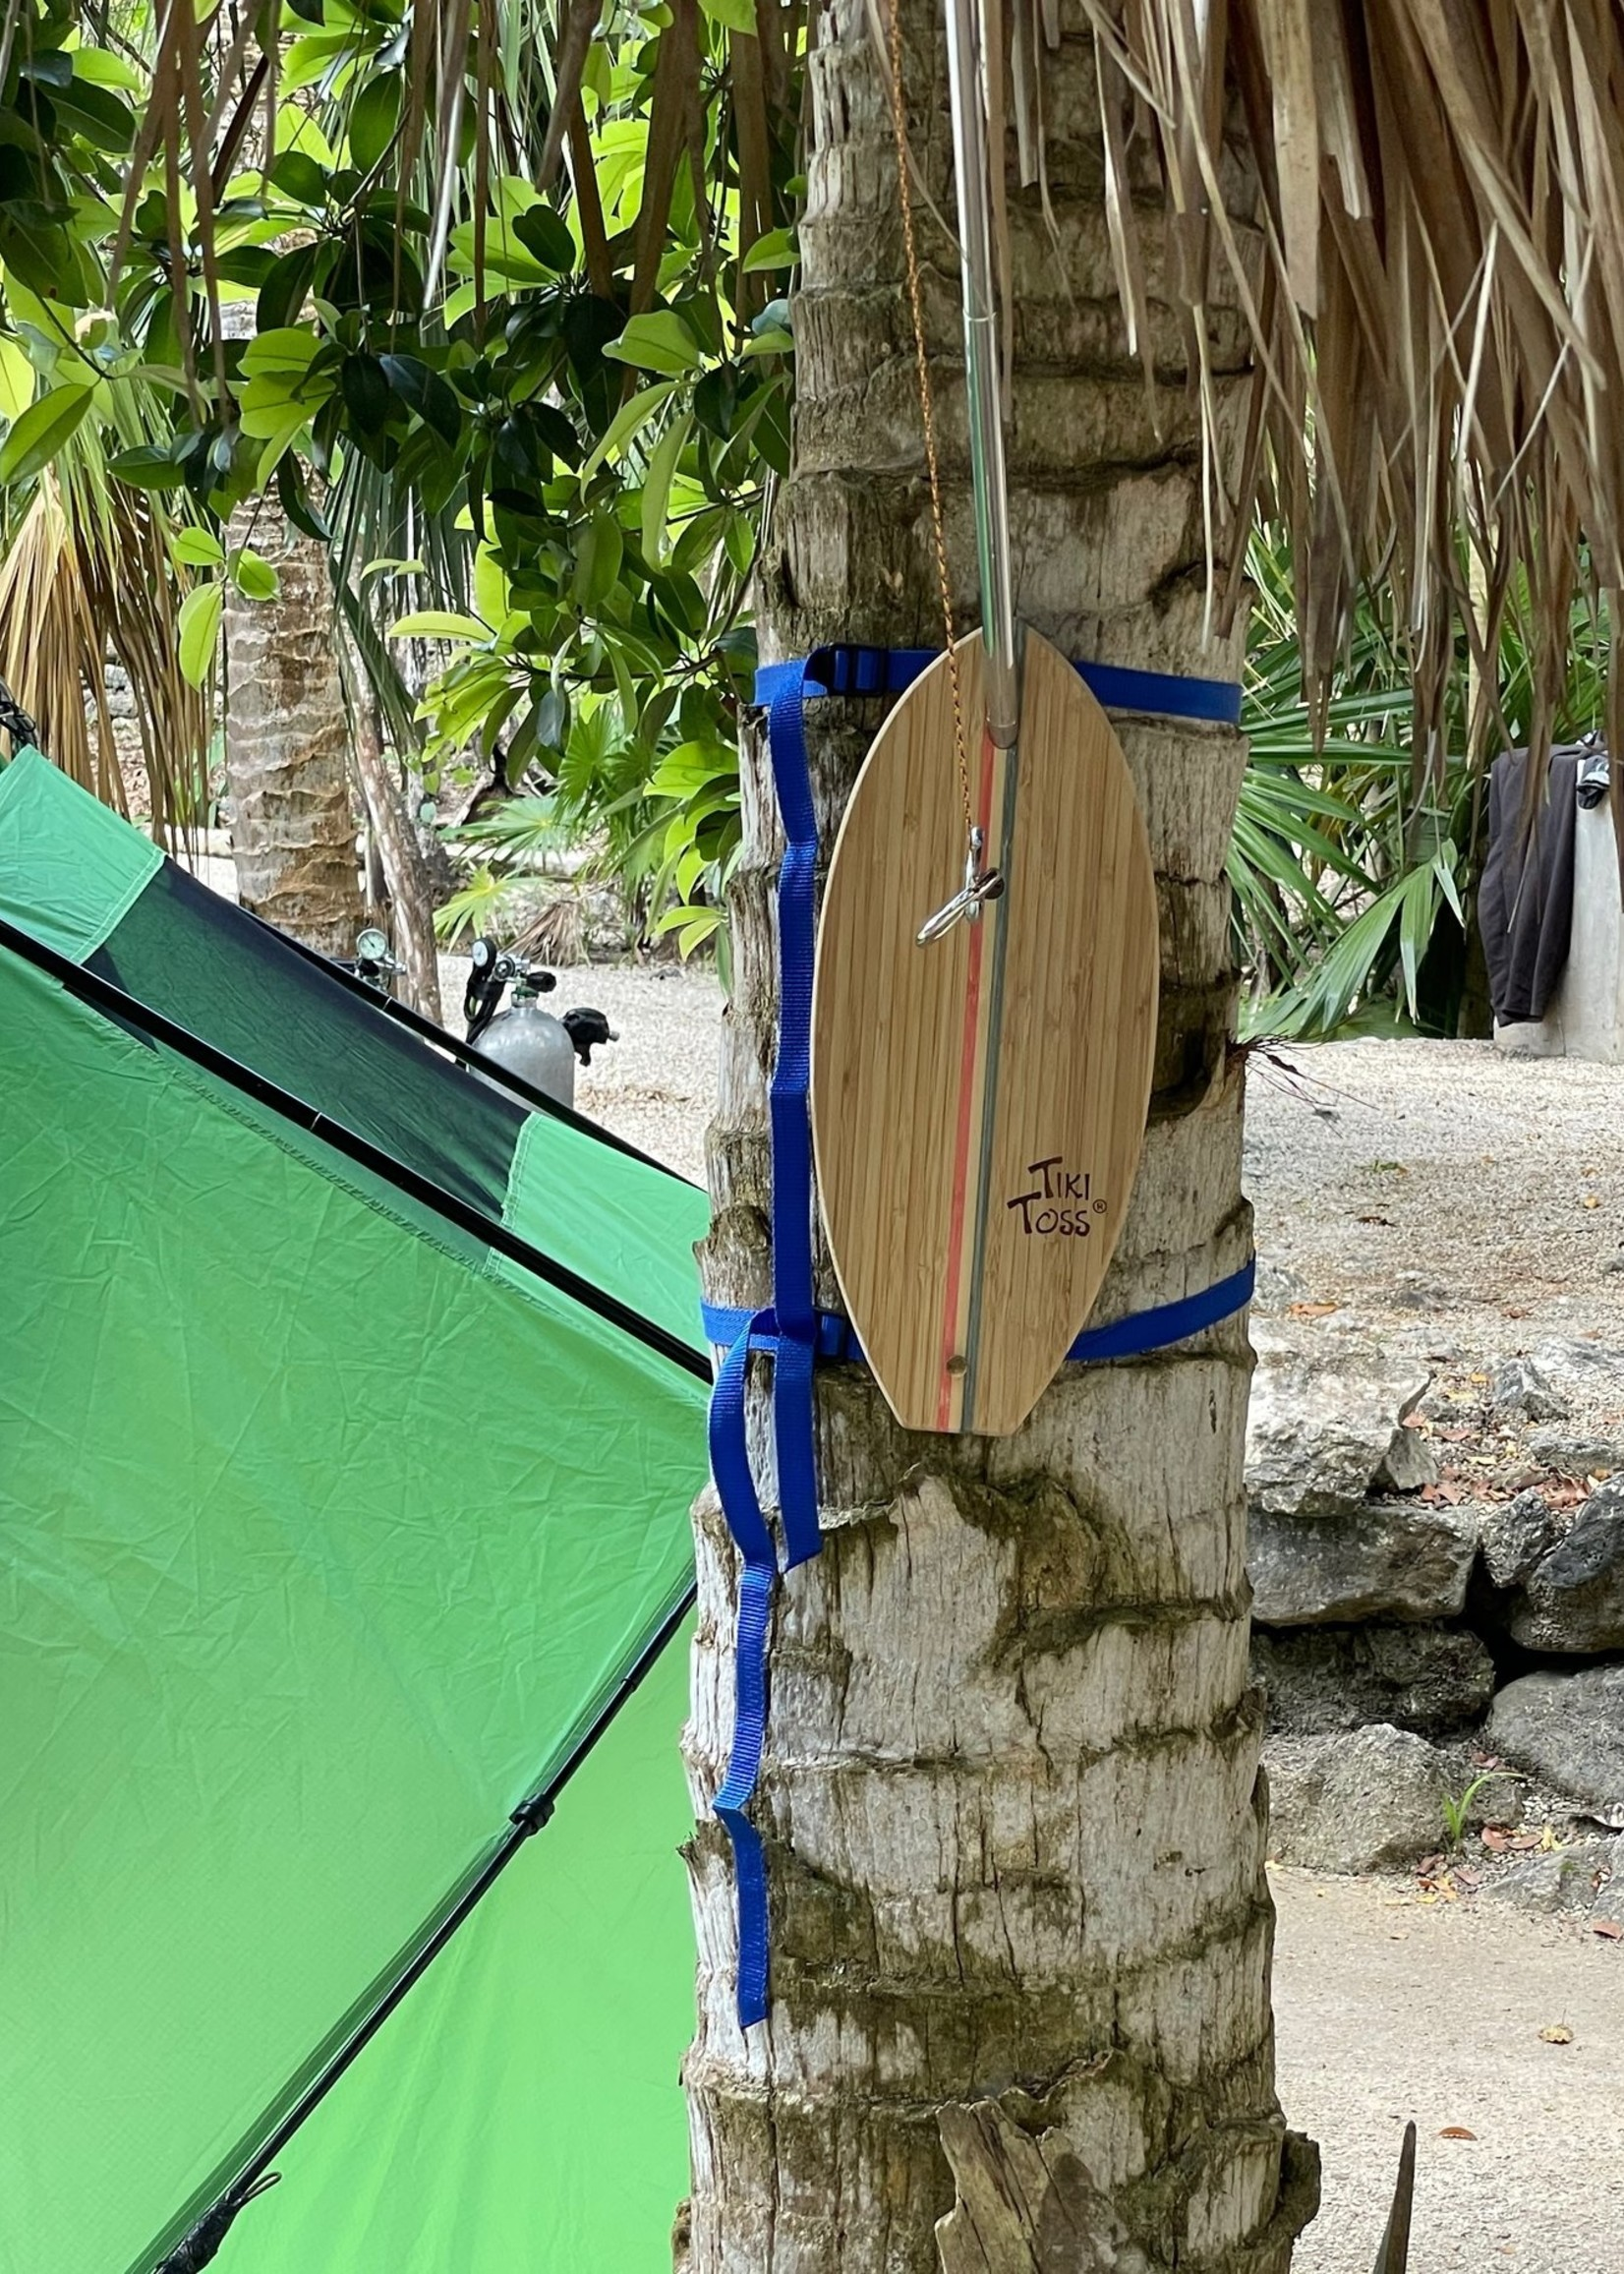 Tiki Toss Camp Ready Straps